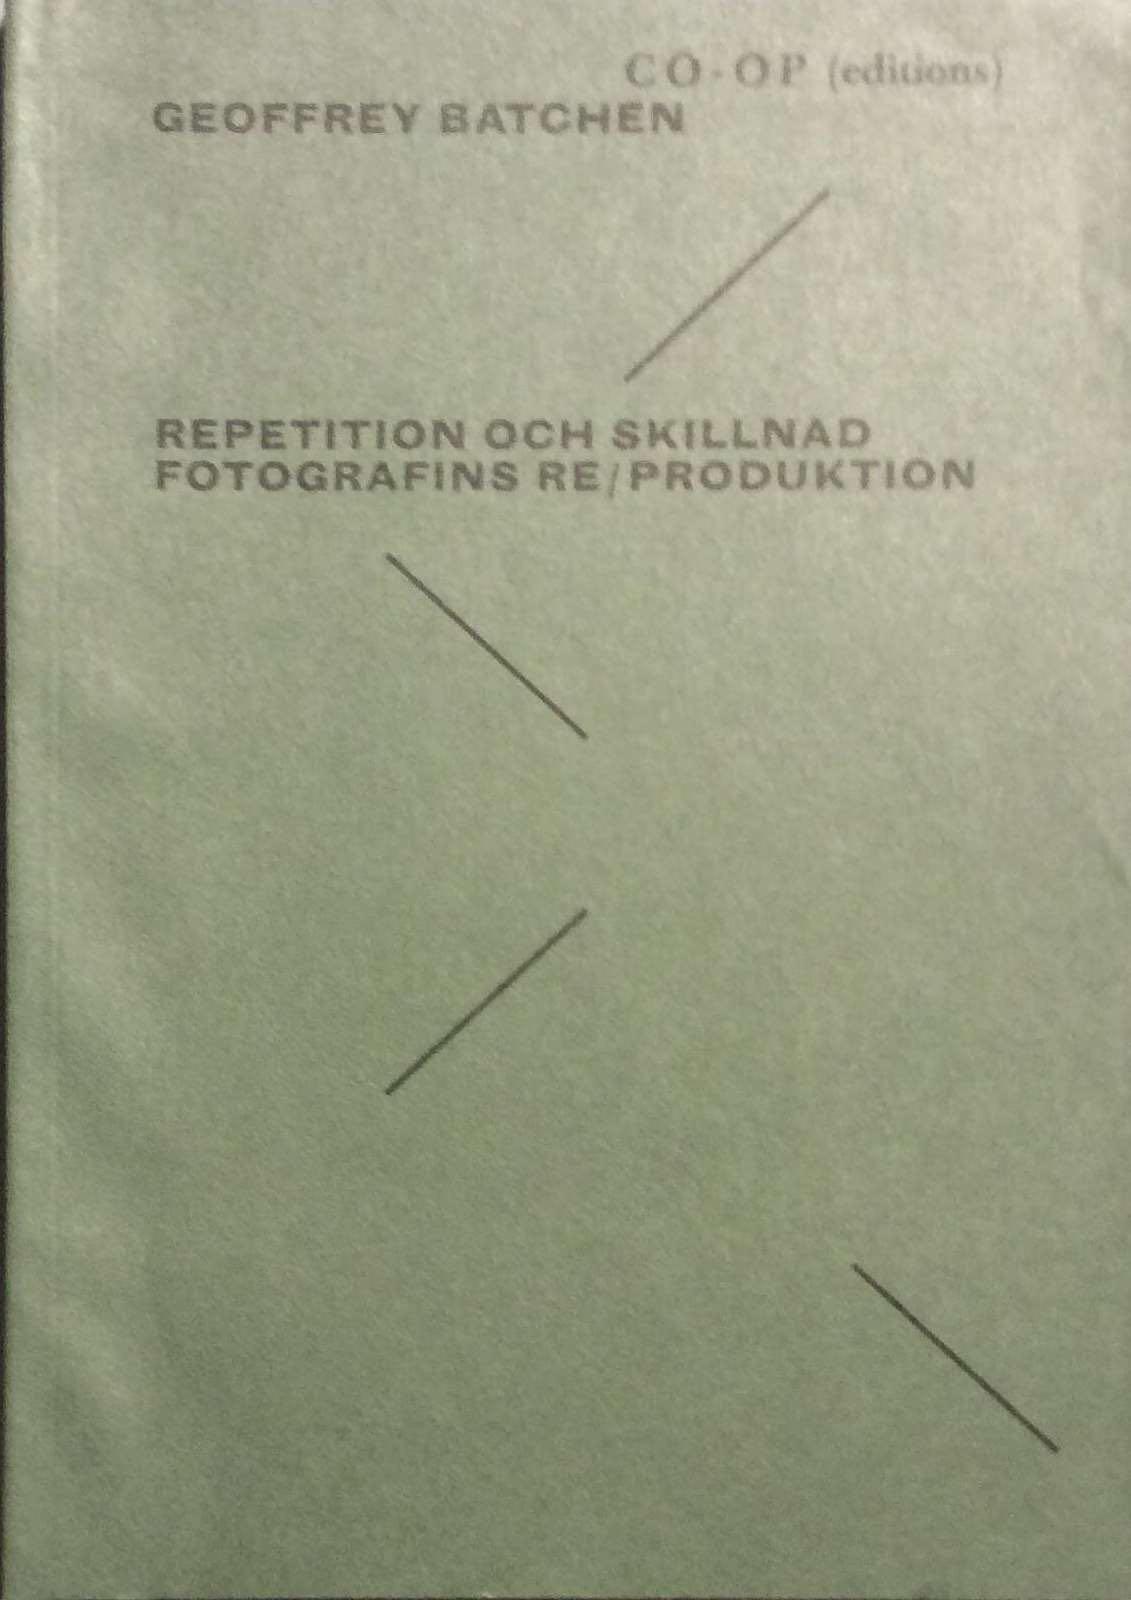 Batchen, Geoffrey. Repetition och skillnad